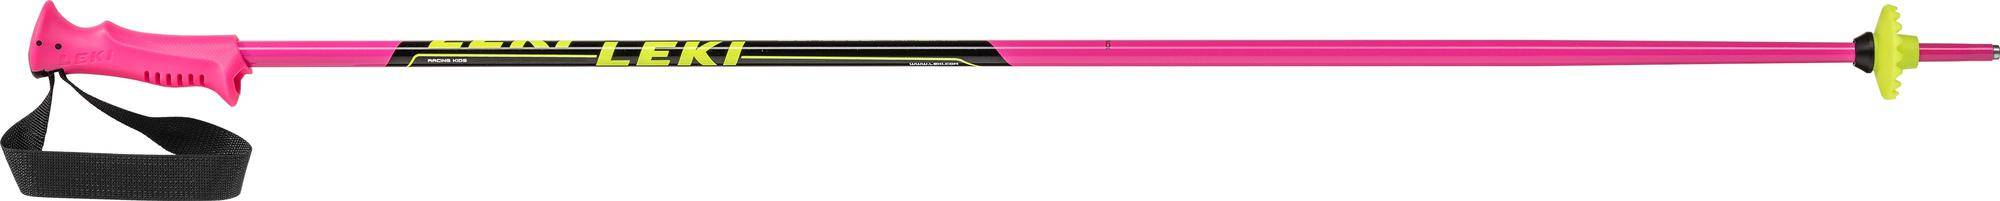 LEKI Racing Kids pink-schwarz-weiss-gelb